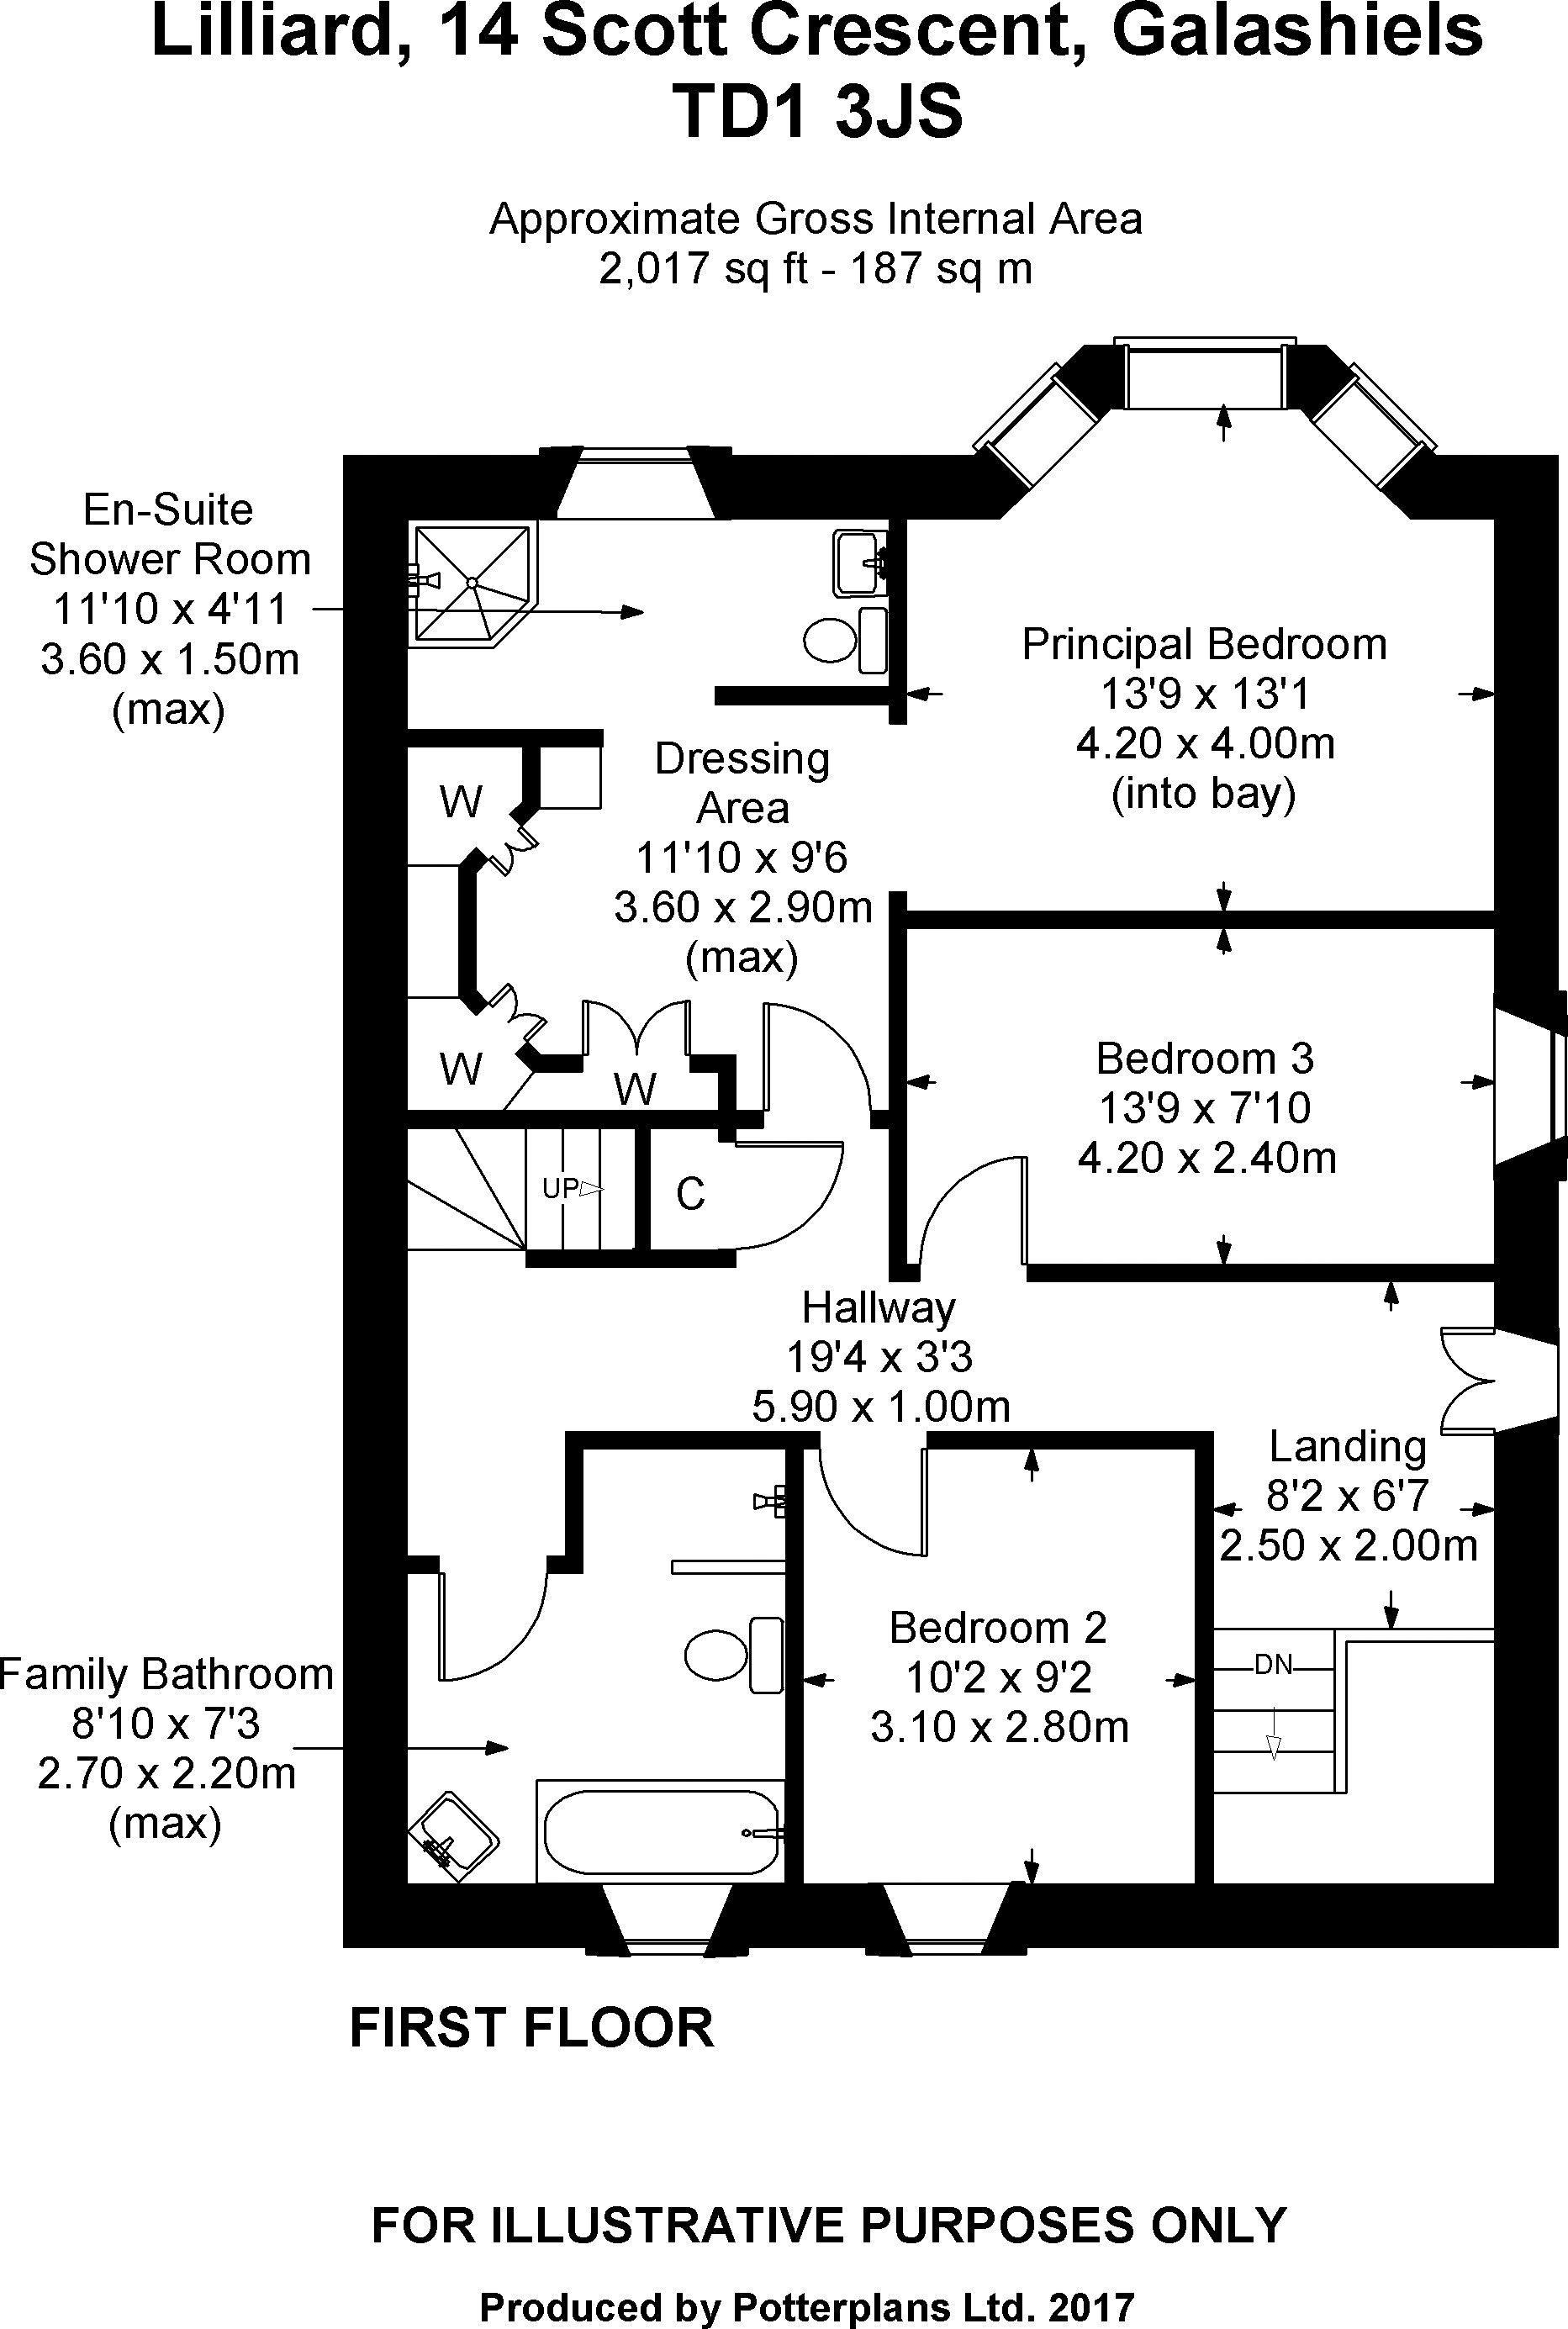 Lilliard First Floor